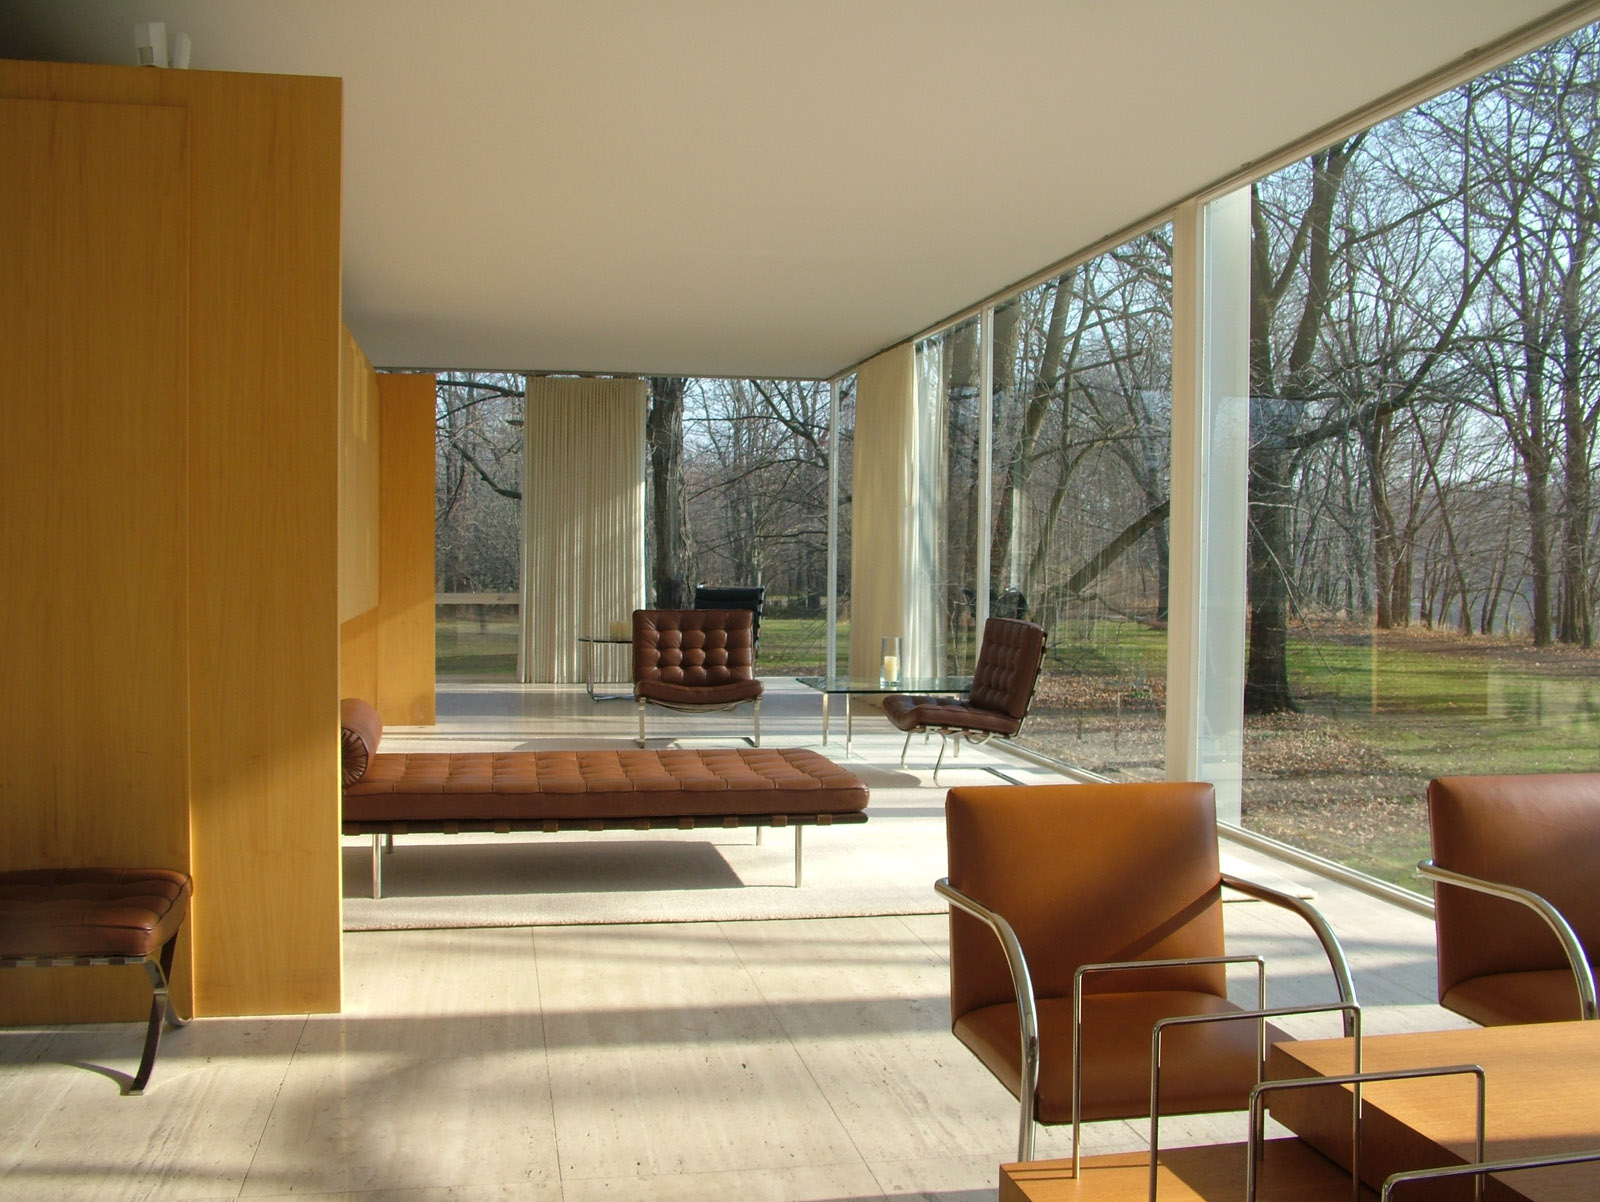 design icons ludwig mies van der rohe. Black Bedroom Furniture Sets. Home Design Ideas